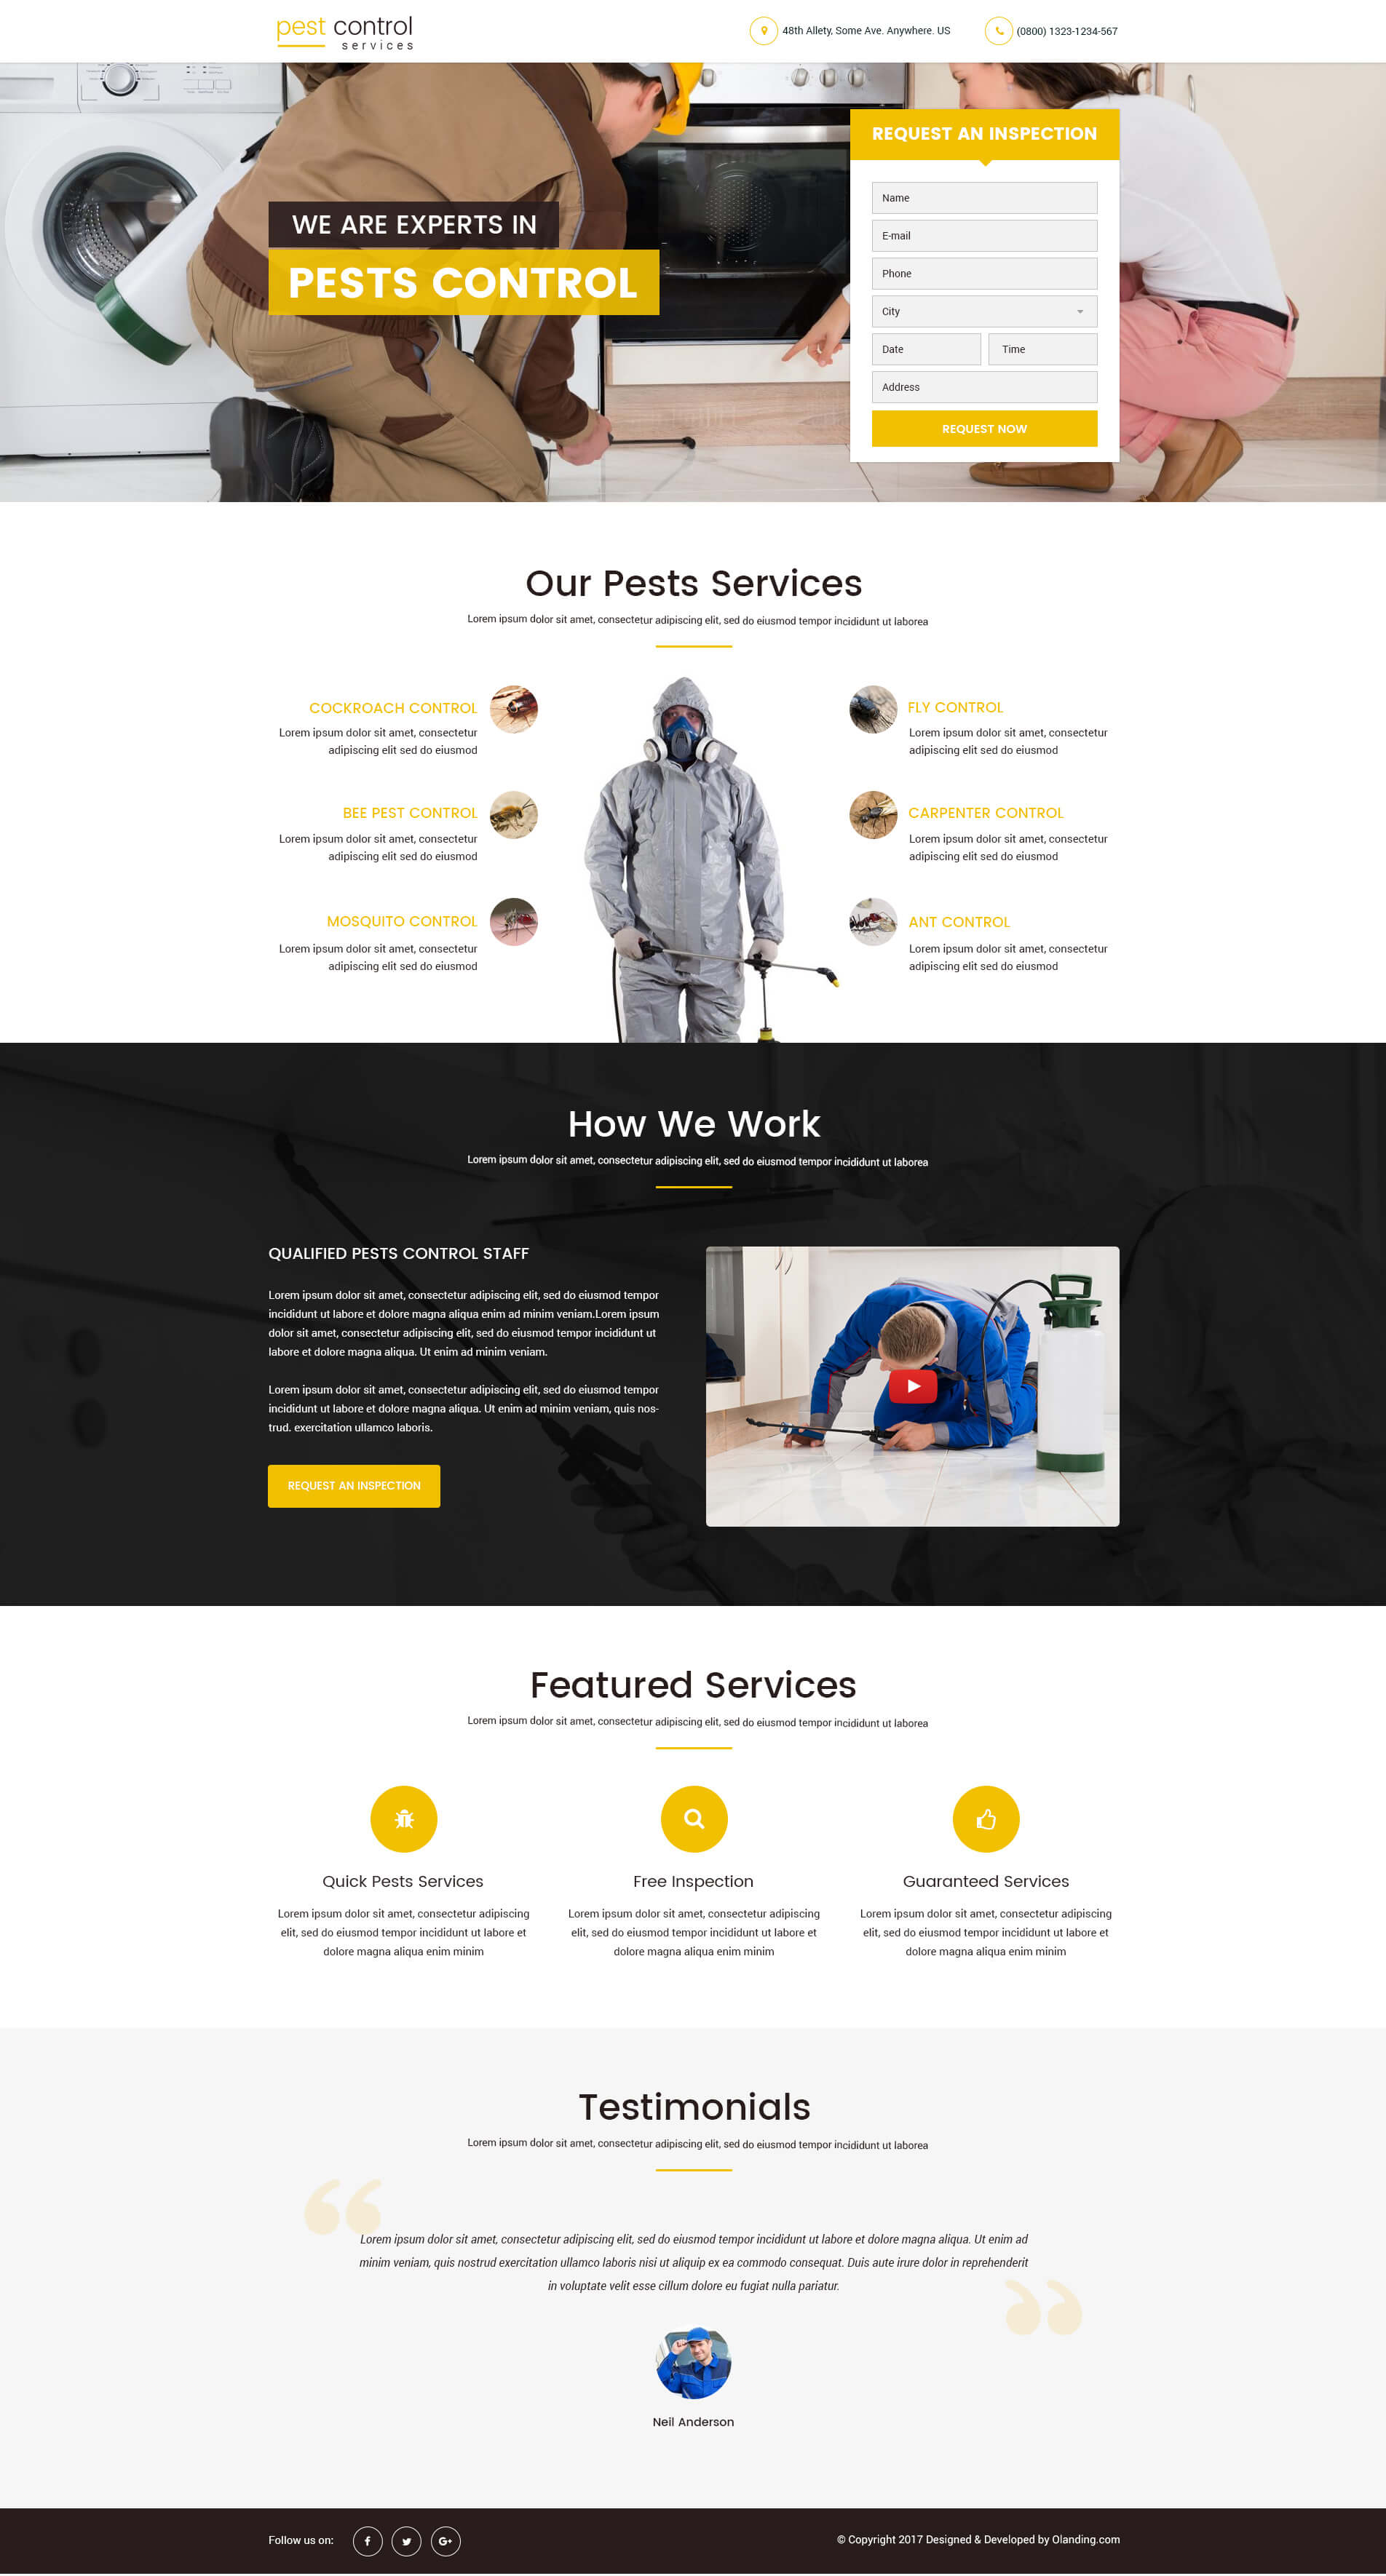 pest control landing page design